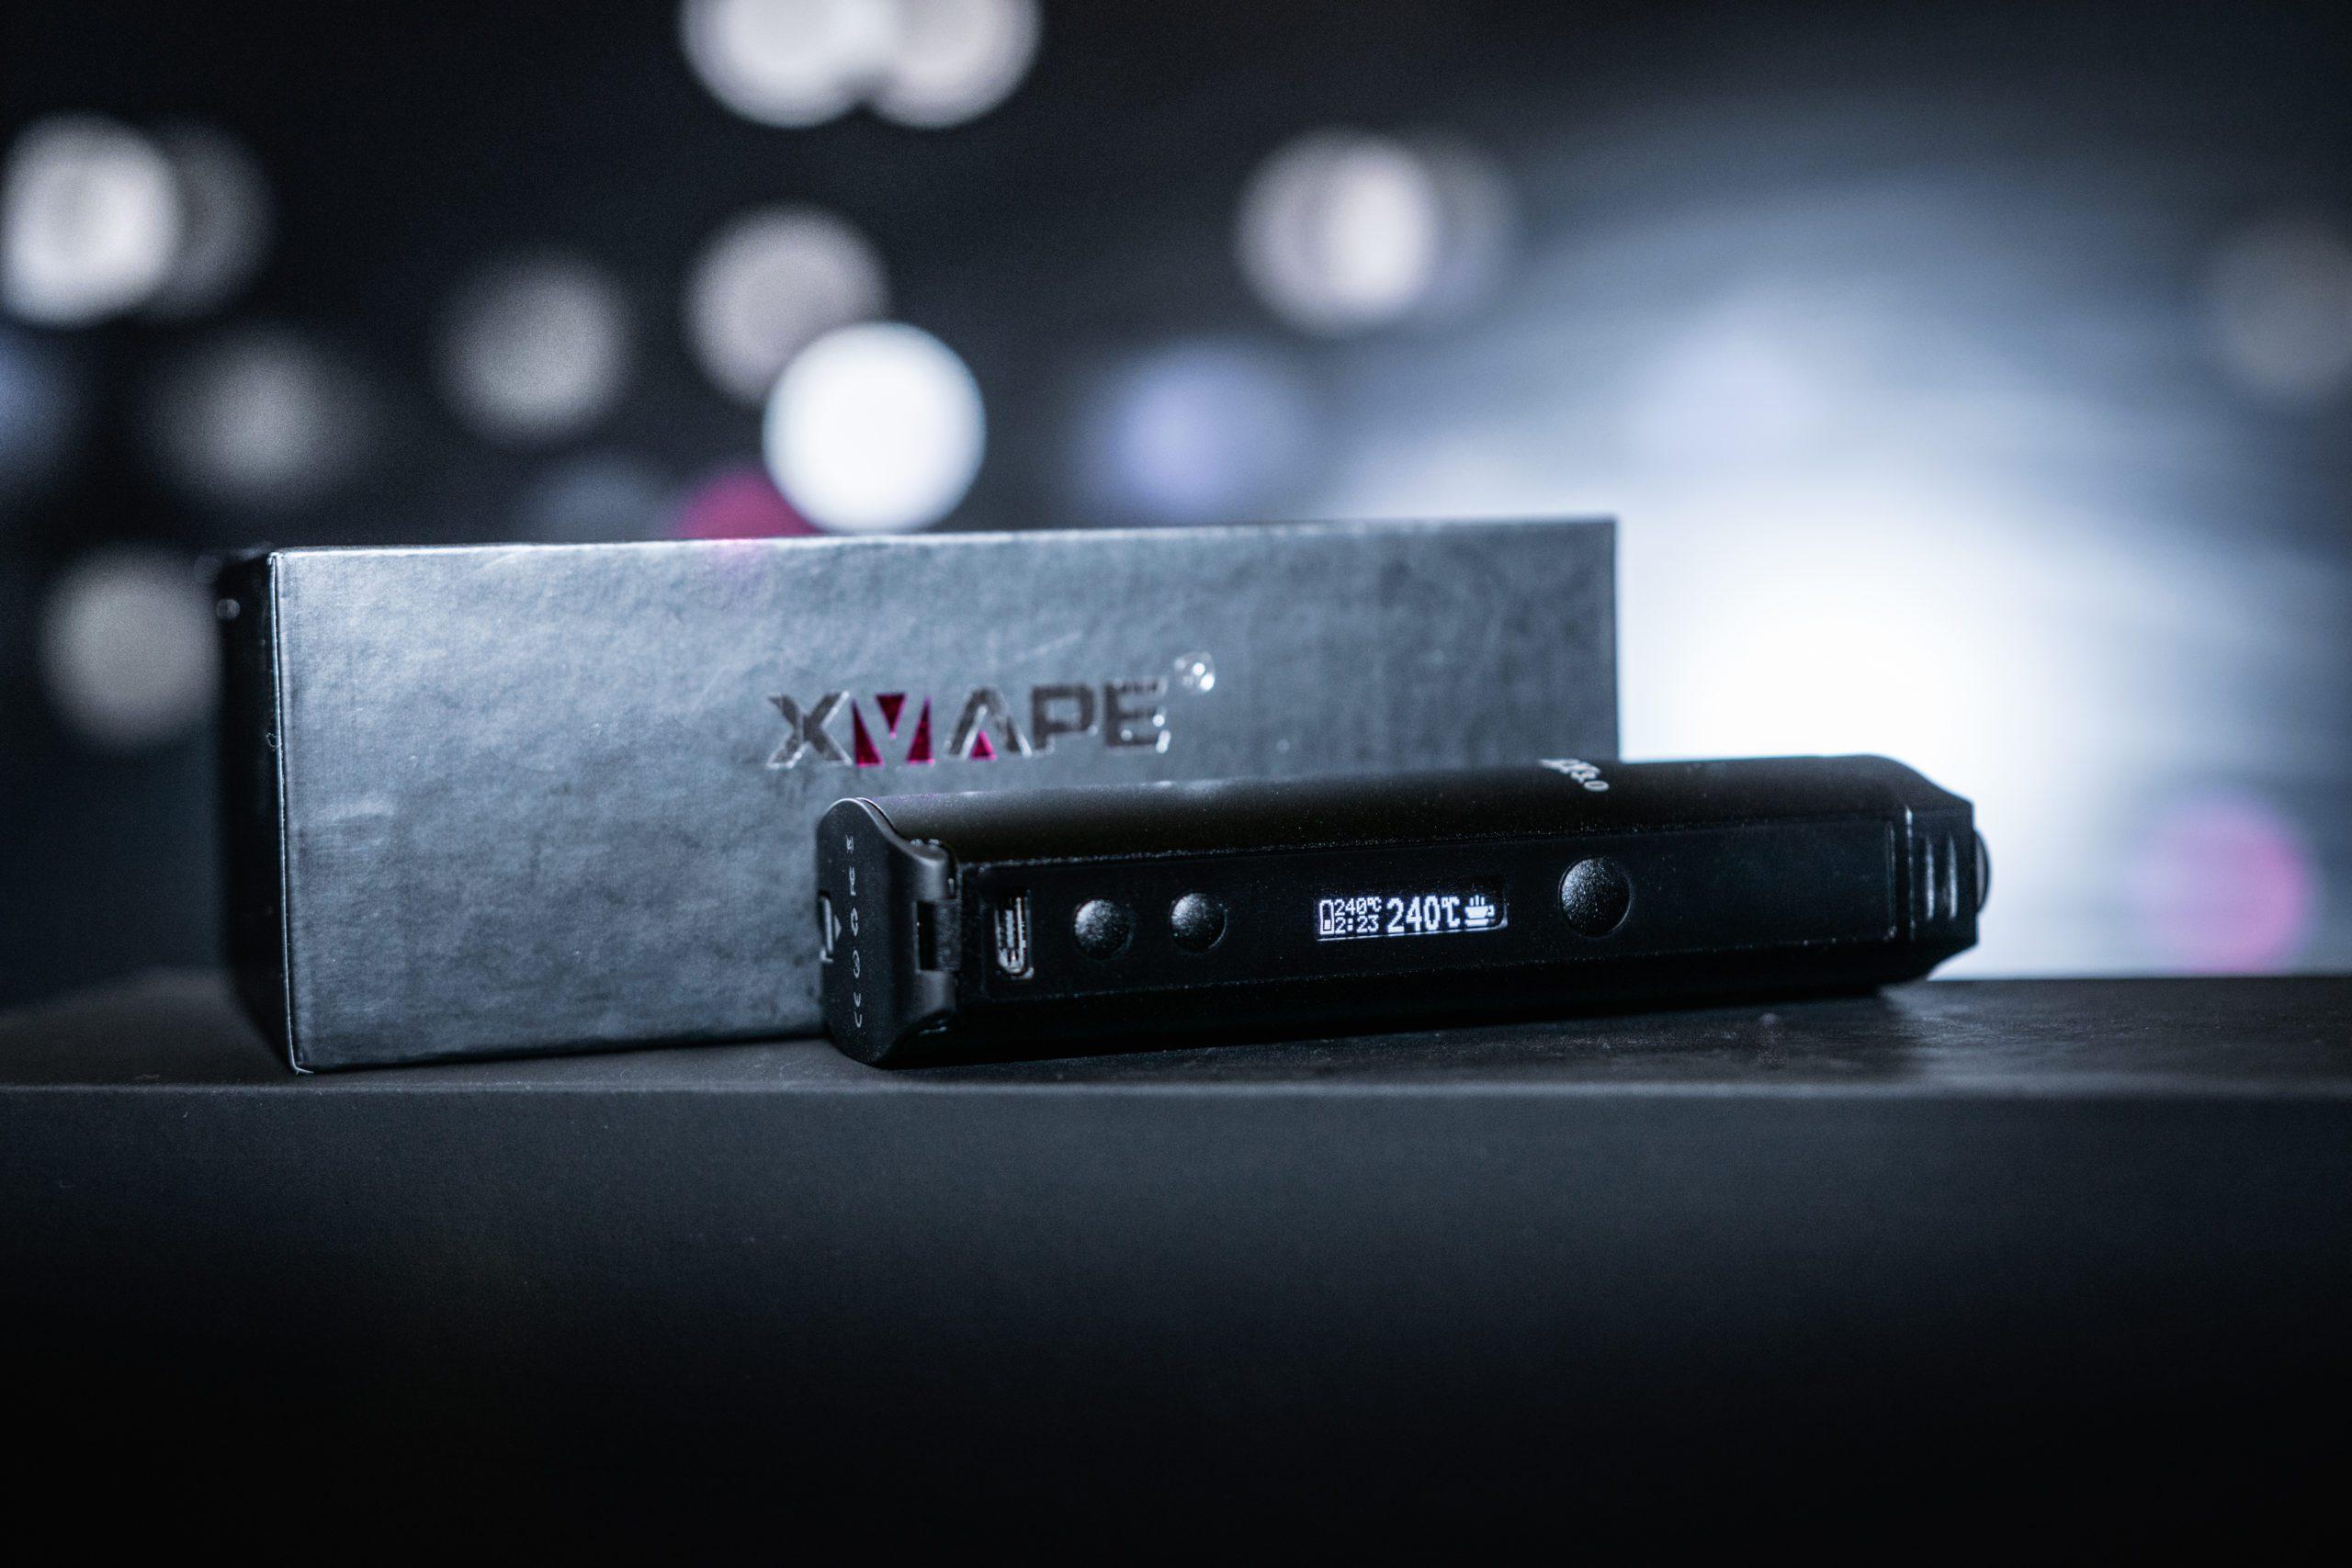 xMax Starry 3.0 Temperature Control